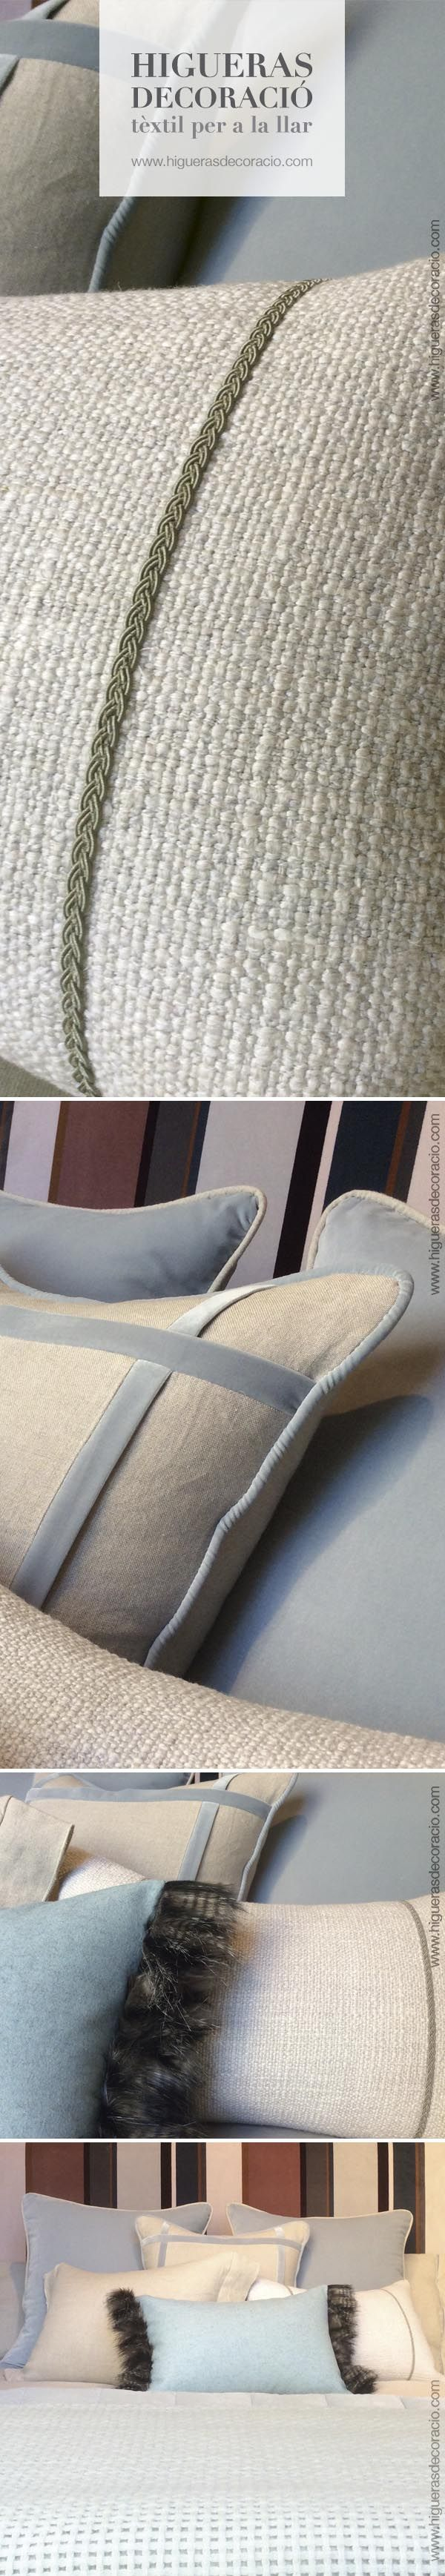 #Cabecero tapizado para la cama. #Cabecero aterciopelado. Juega con las telas de los cojines, #telas de diferentes brillos y texturas. #Cojín con pasamanería. #Plaid de #angora a tono para los pies de la cama. #Capçal entapissat. #Capçal de vellut. Juga amb les teles dels coixins, #teles de diferents brillantors i textures. #Coixí amb passamanaria. #Plaid d'#angora a to pels peus del llit.  http://www.higuerasdecoracio.com/es